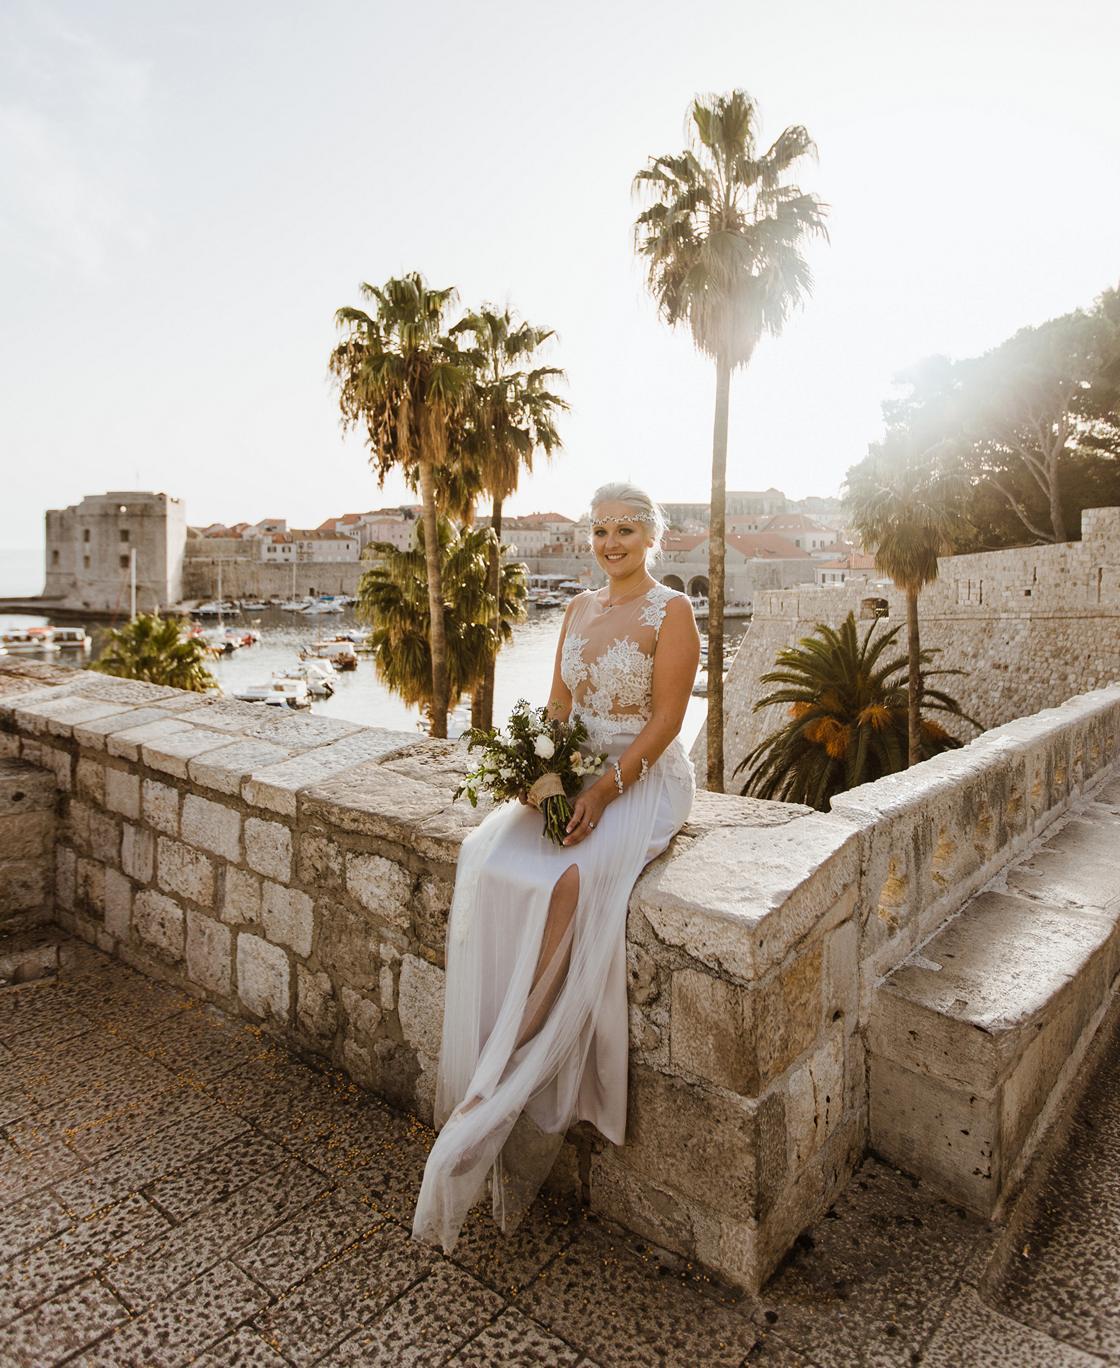 October Outdoor Wedding Ideas: Getting Married In Villa Sheherezade